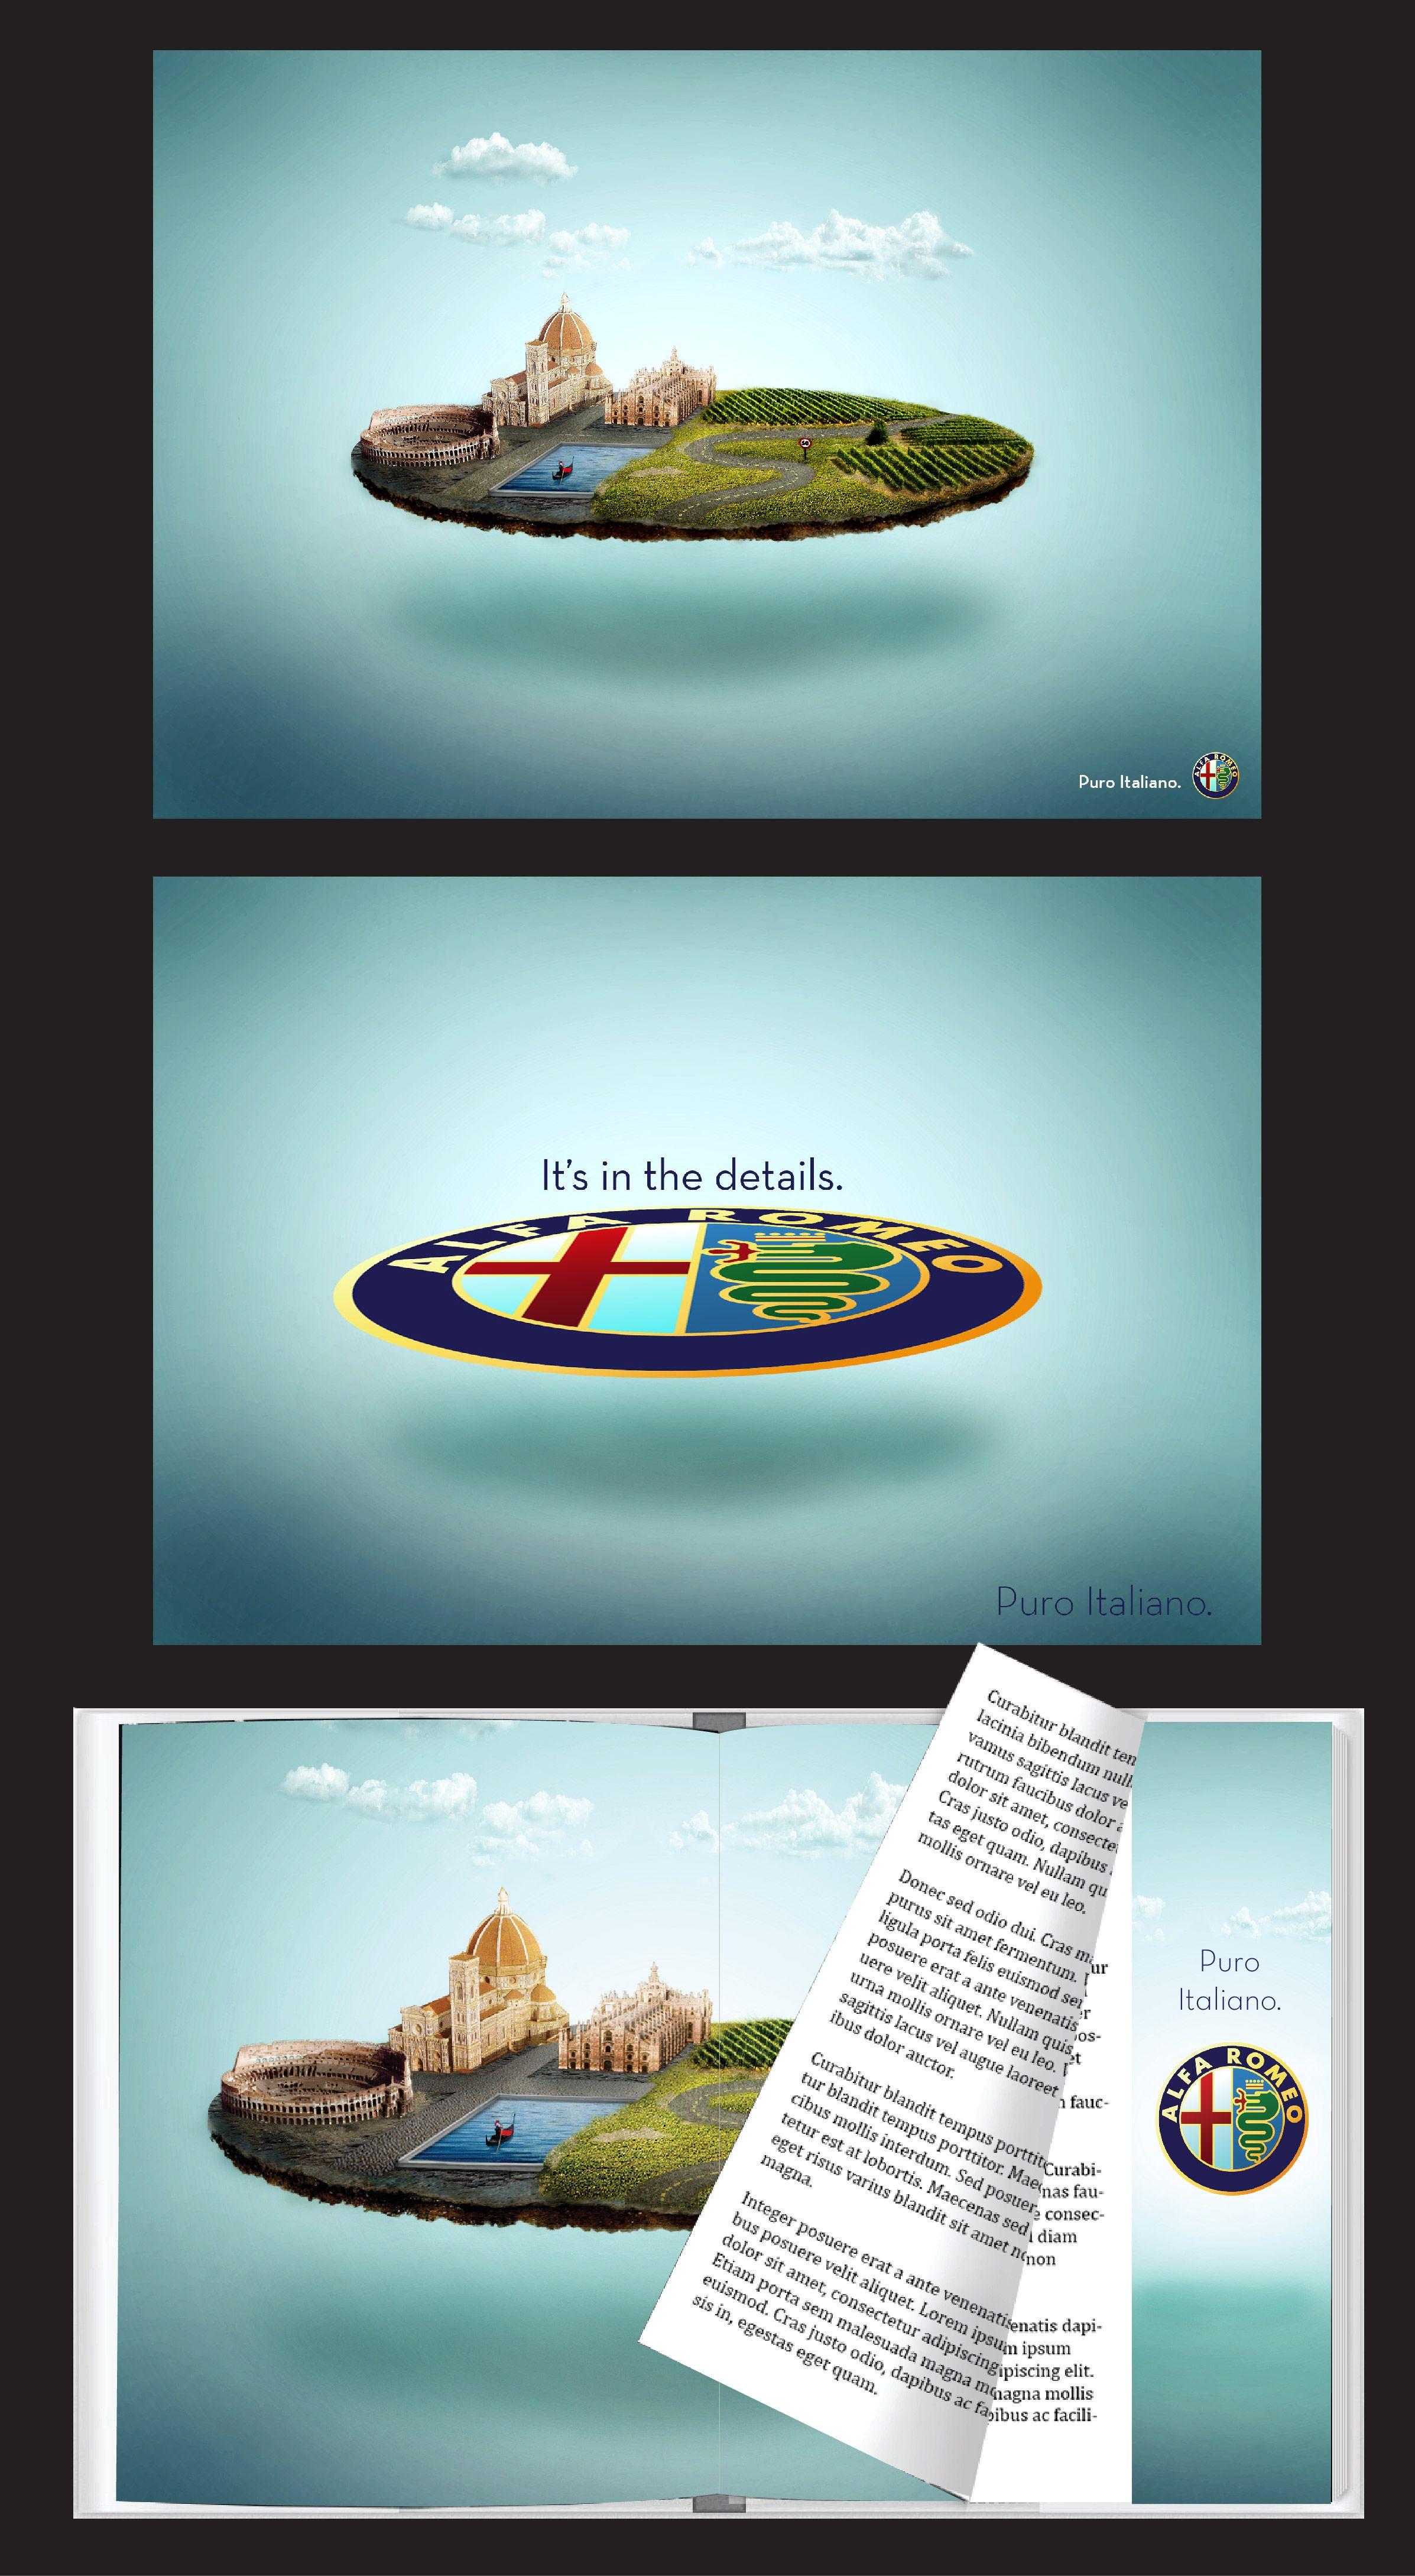 Sheldon s diy miata alignment page - Alfa Romeo Print Ad